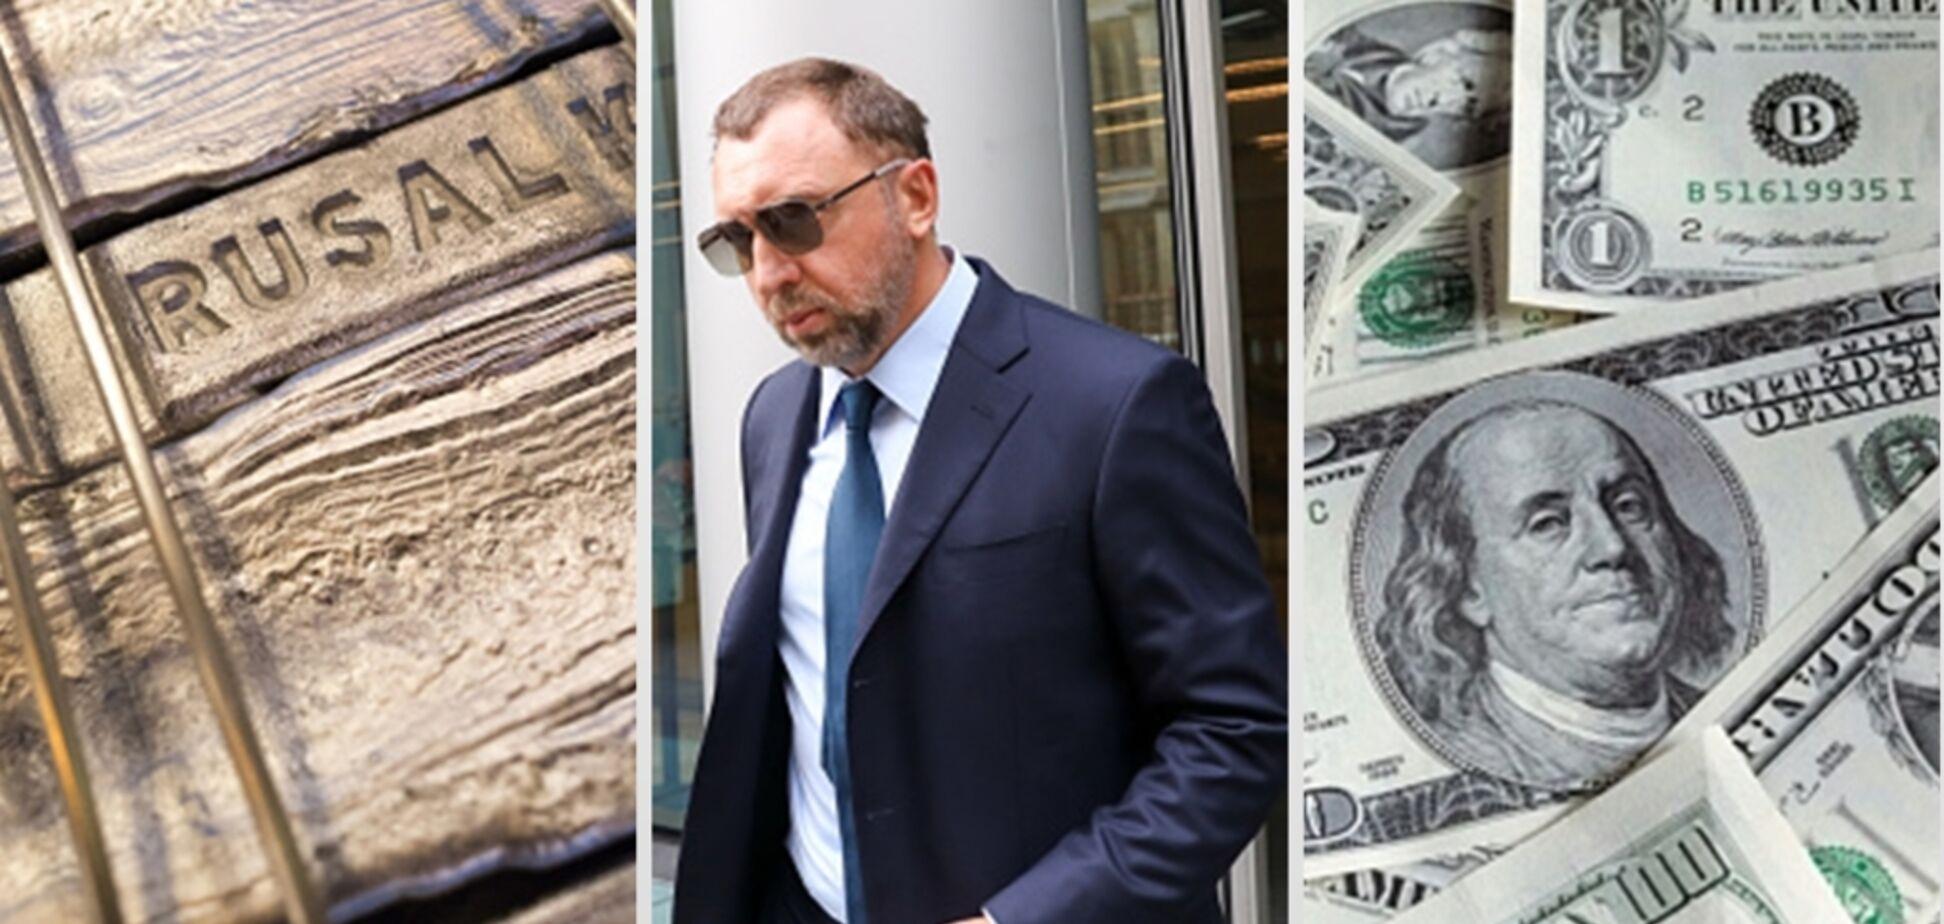 Путинский олигарх ликует: почему США снимают санкции